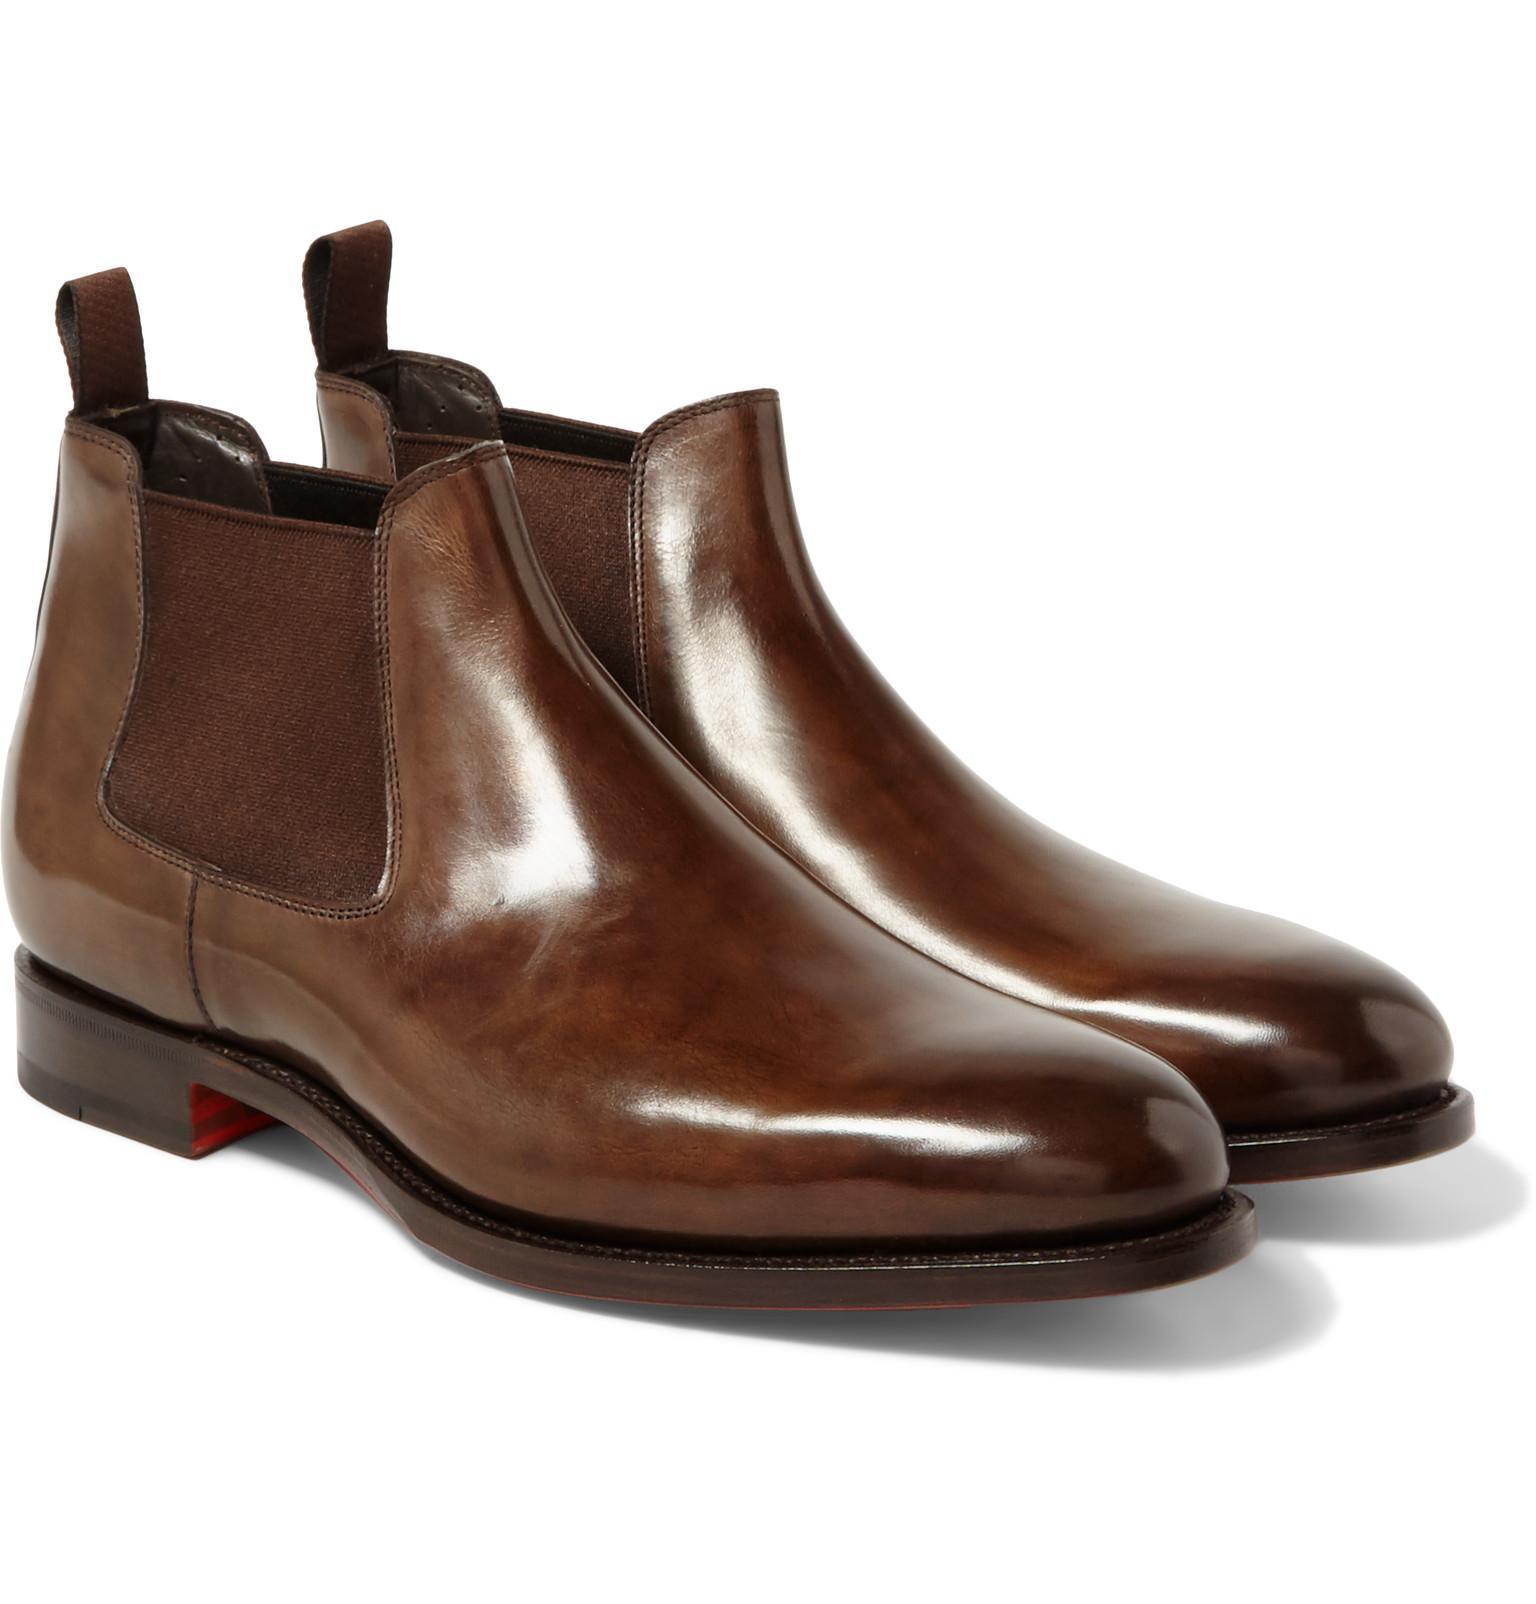 santoni polished leather chelsea boots in brown for men lyst. Black Bedroom Furniture Sets. Home Design Ideas